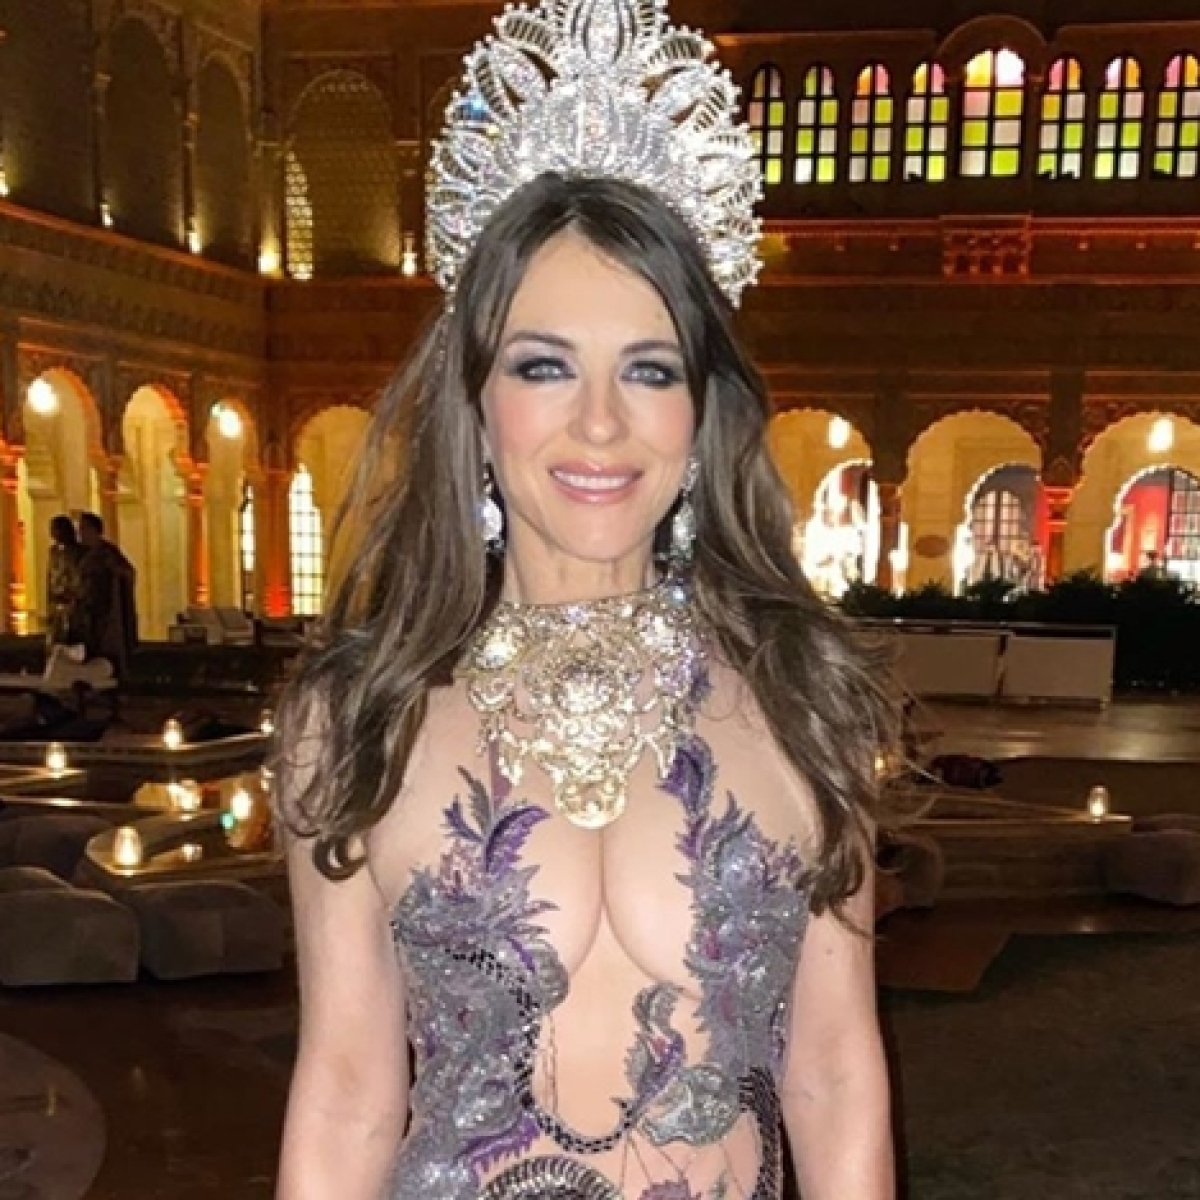 'That's proper naughty': Elizabeth Hurley raises desi brows with sheer dress in Rajasthan